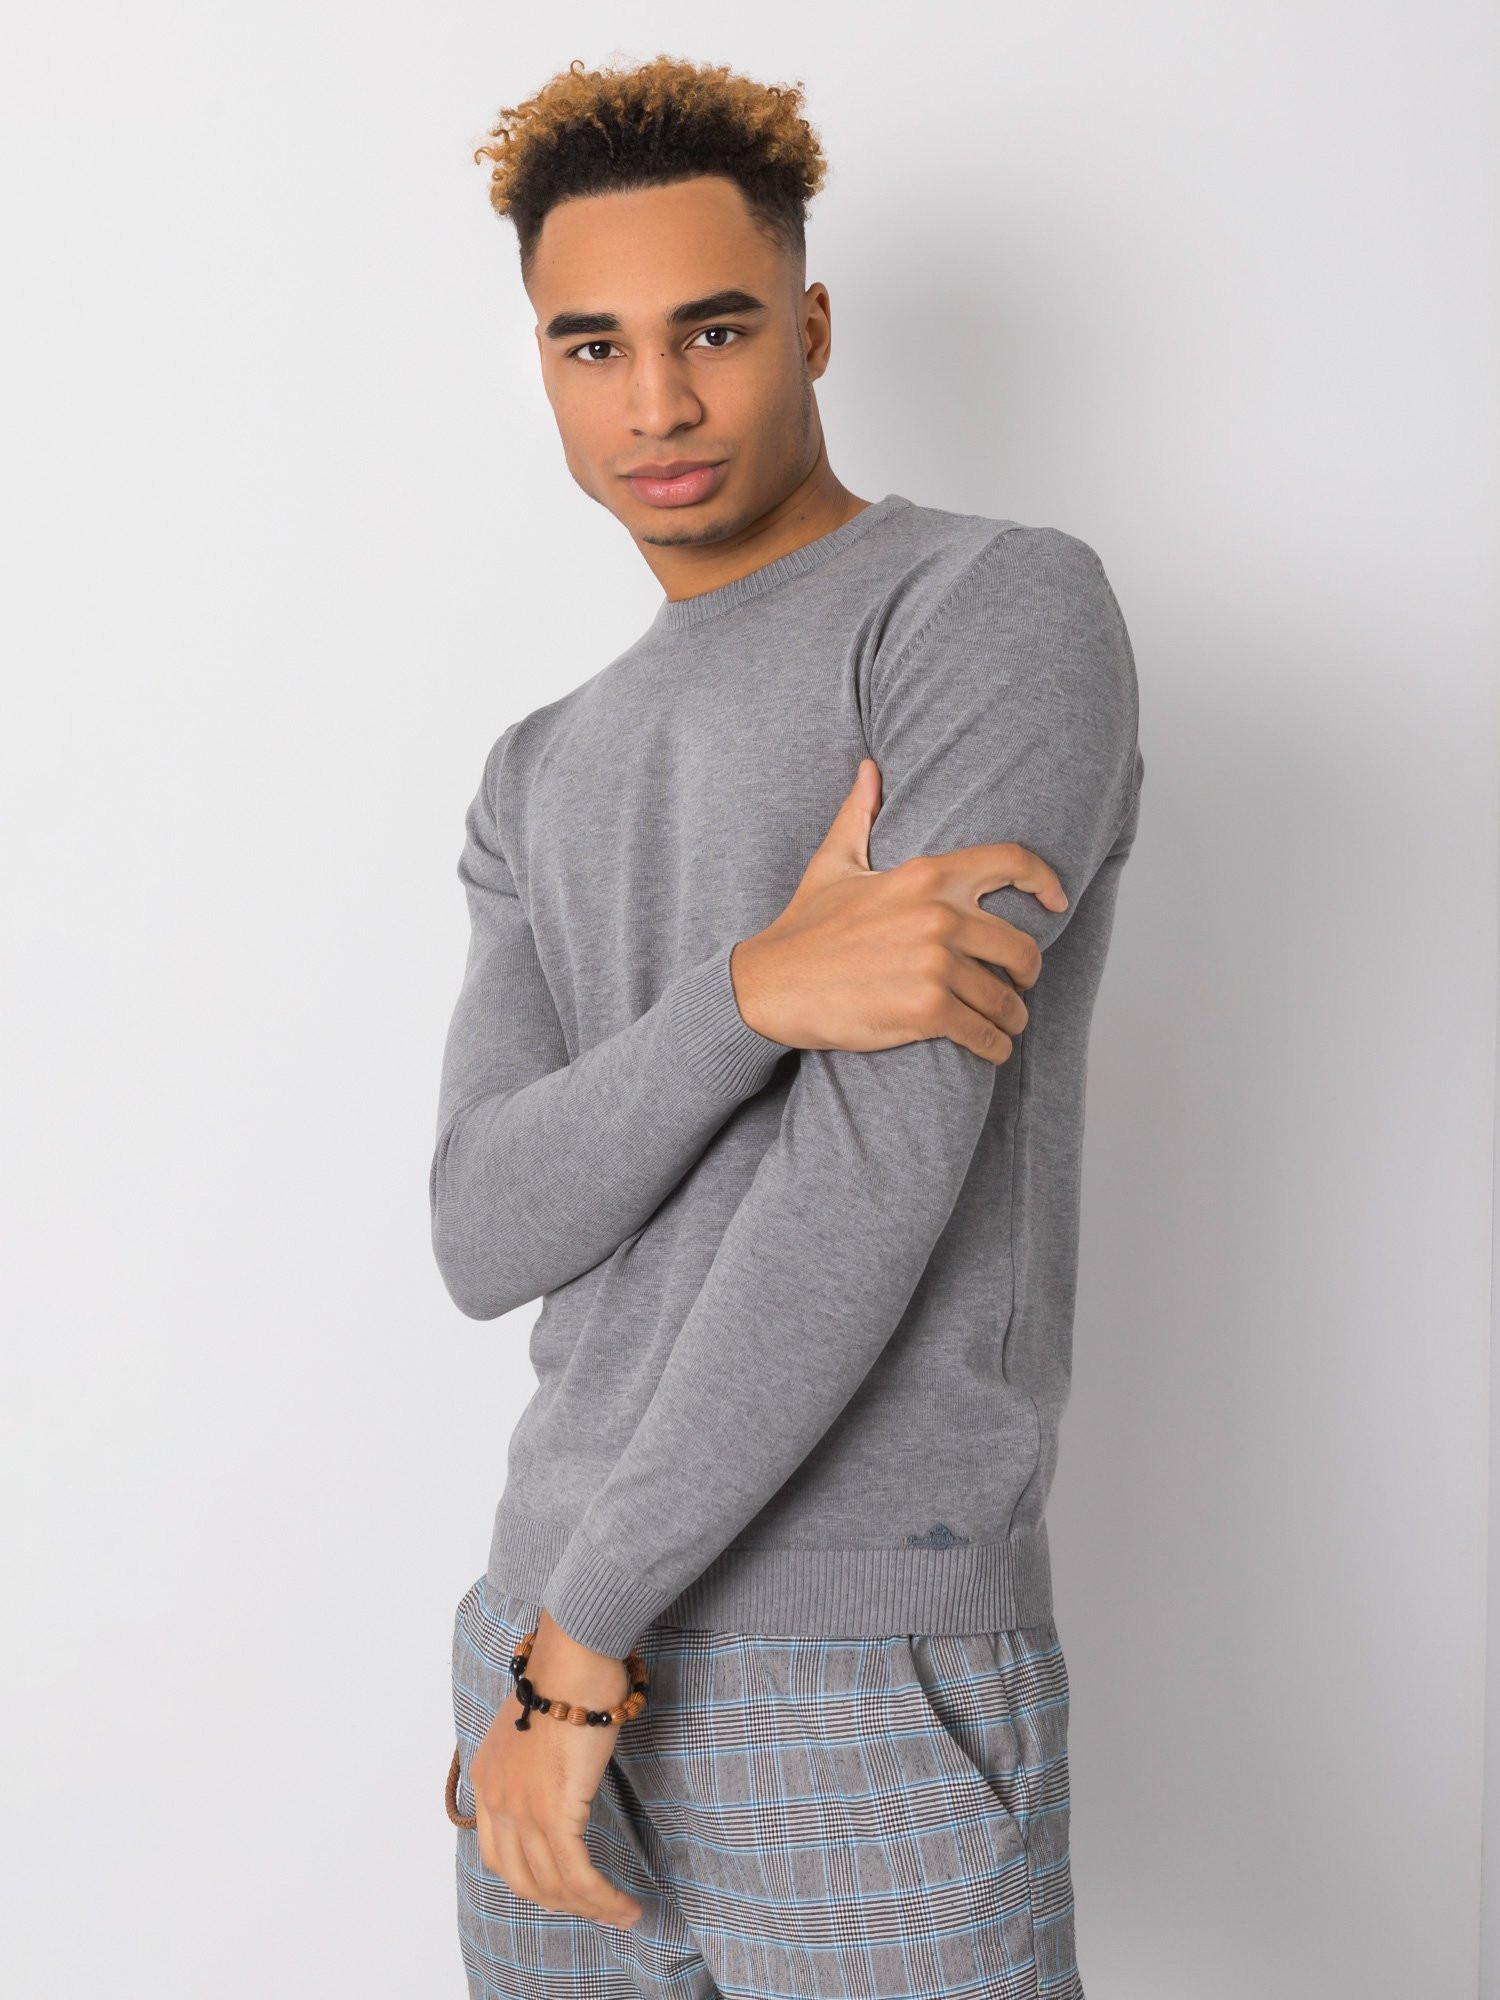 Šedý svetr pro muže LIWALI M